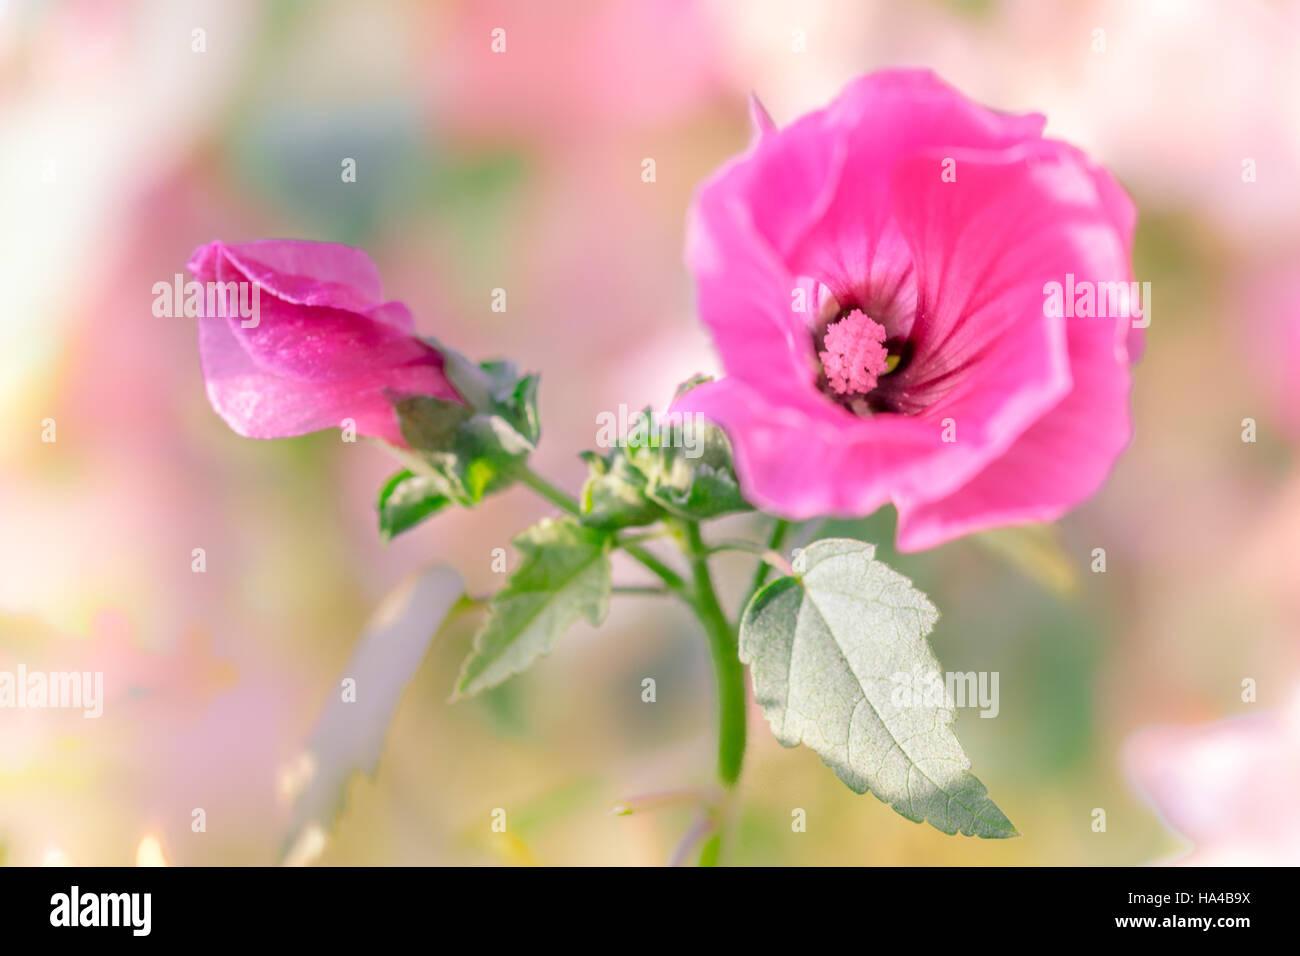 beautifgul garden flowers - Stock Image